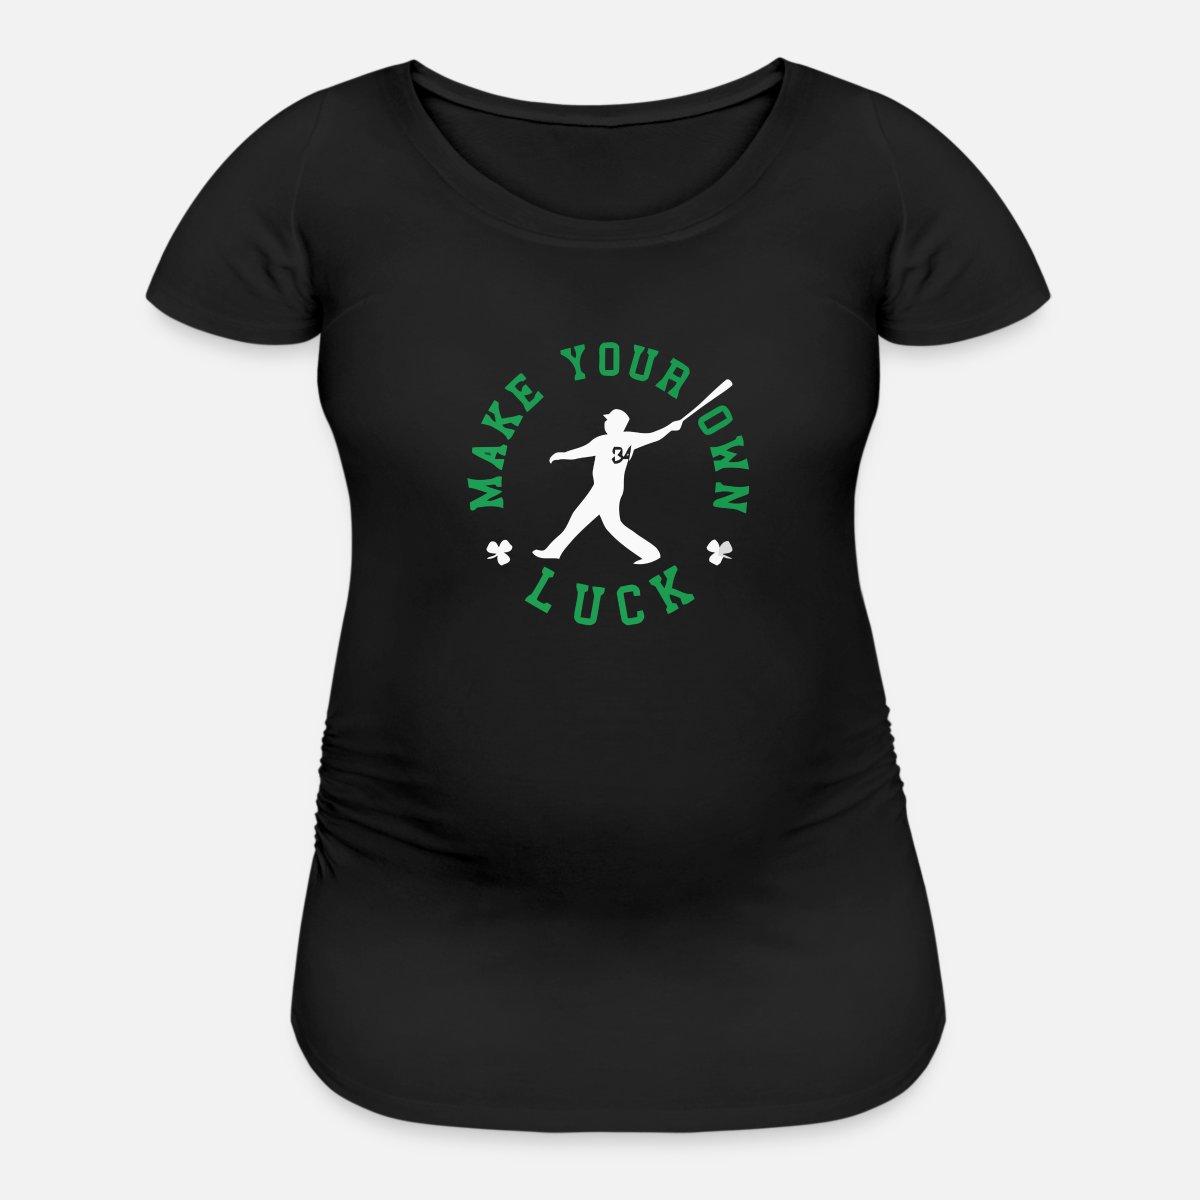 91061bef Make Your Own Luck - David Ortiz Children's Fund Maternity T-Shirt    Spreadshirt